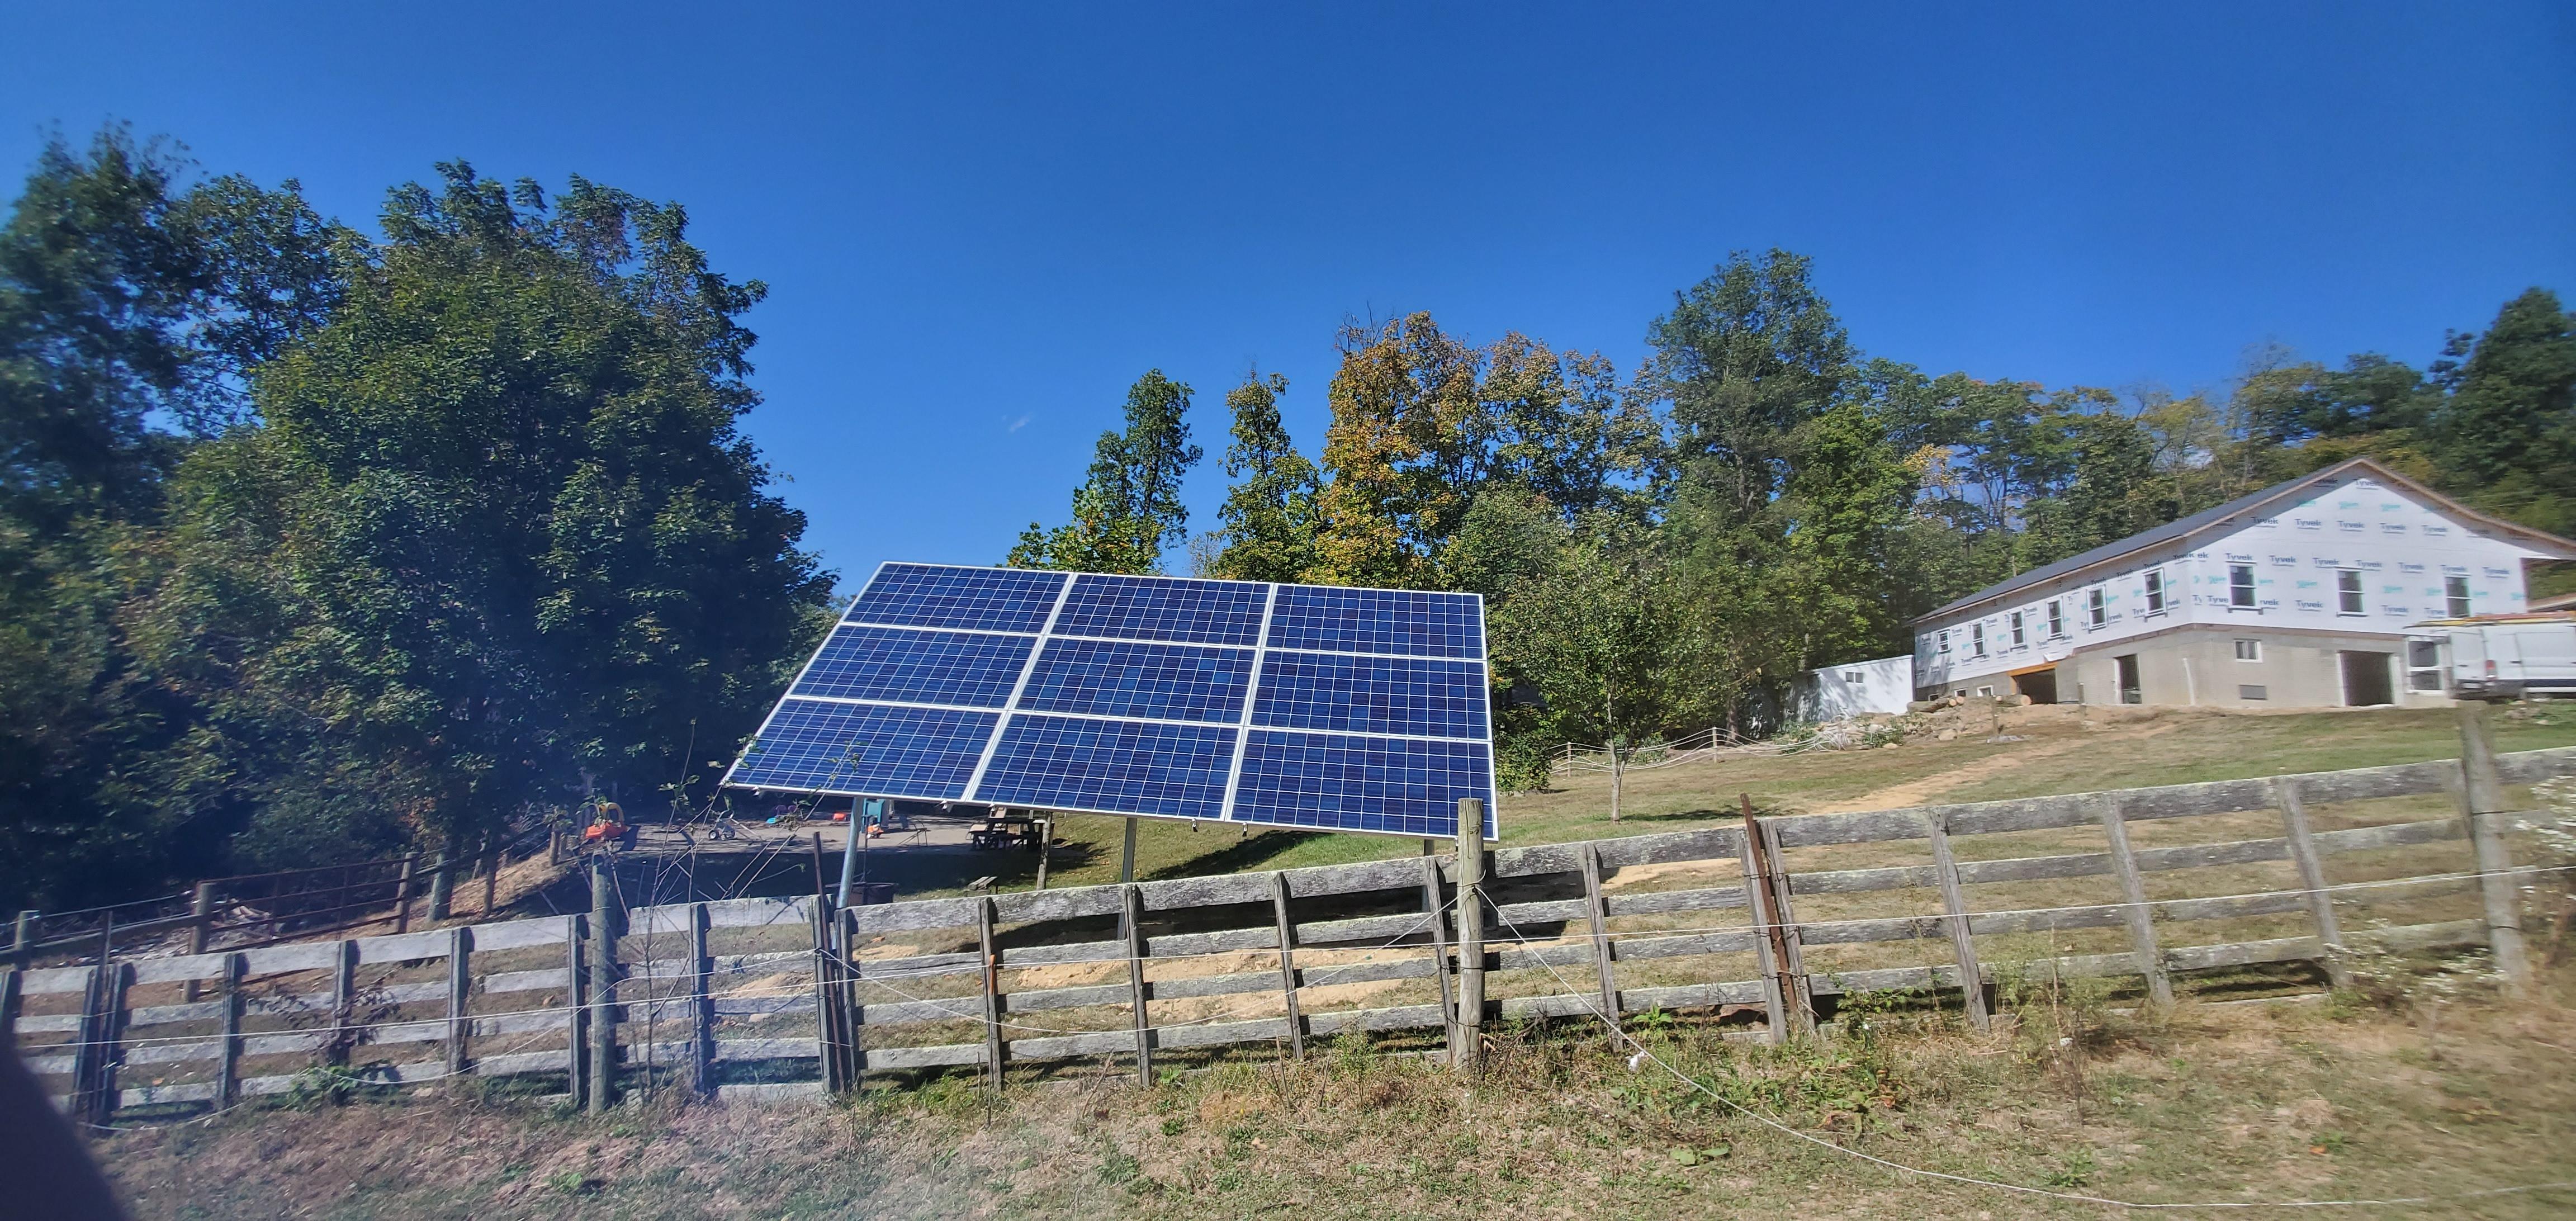 Duane Kline Off Grid Solar